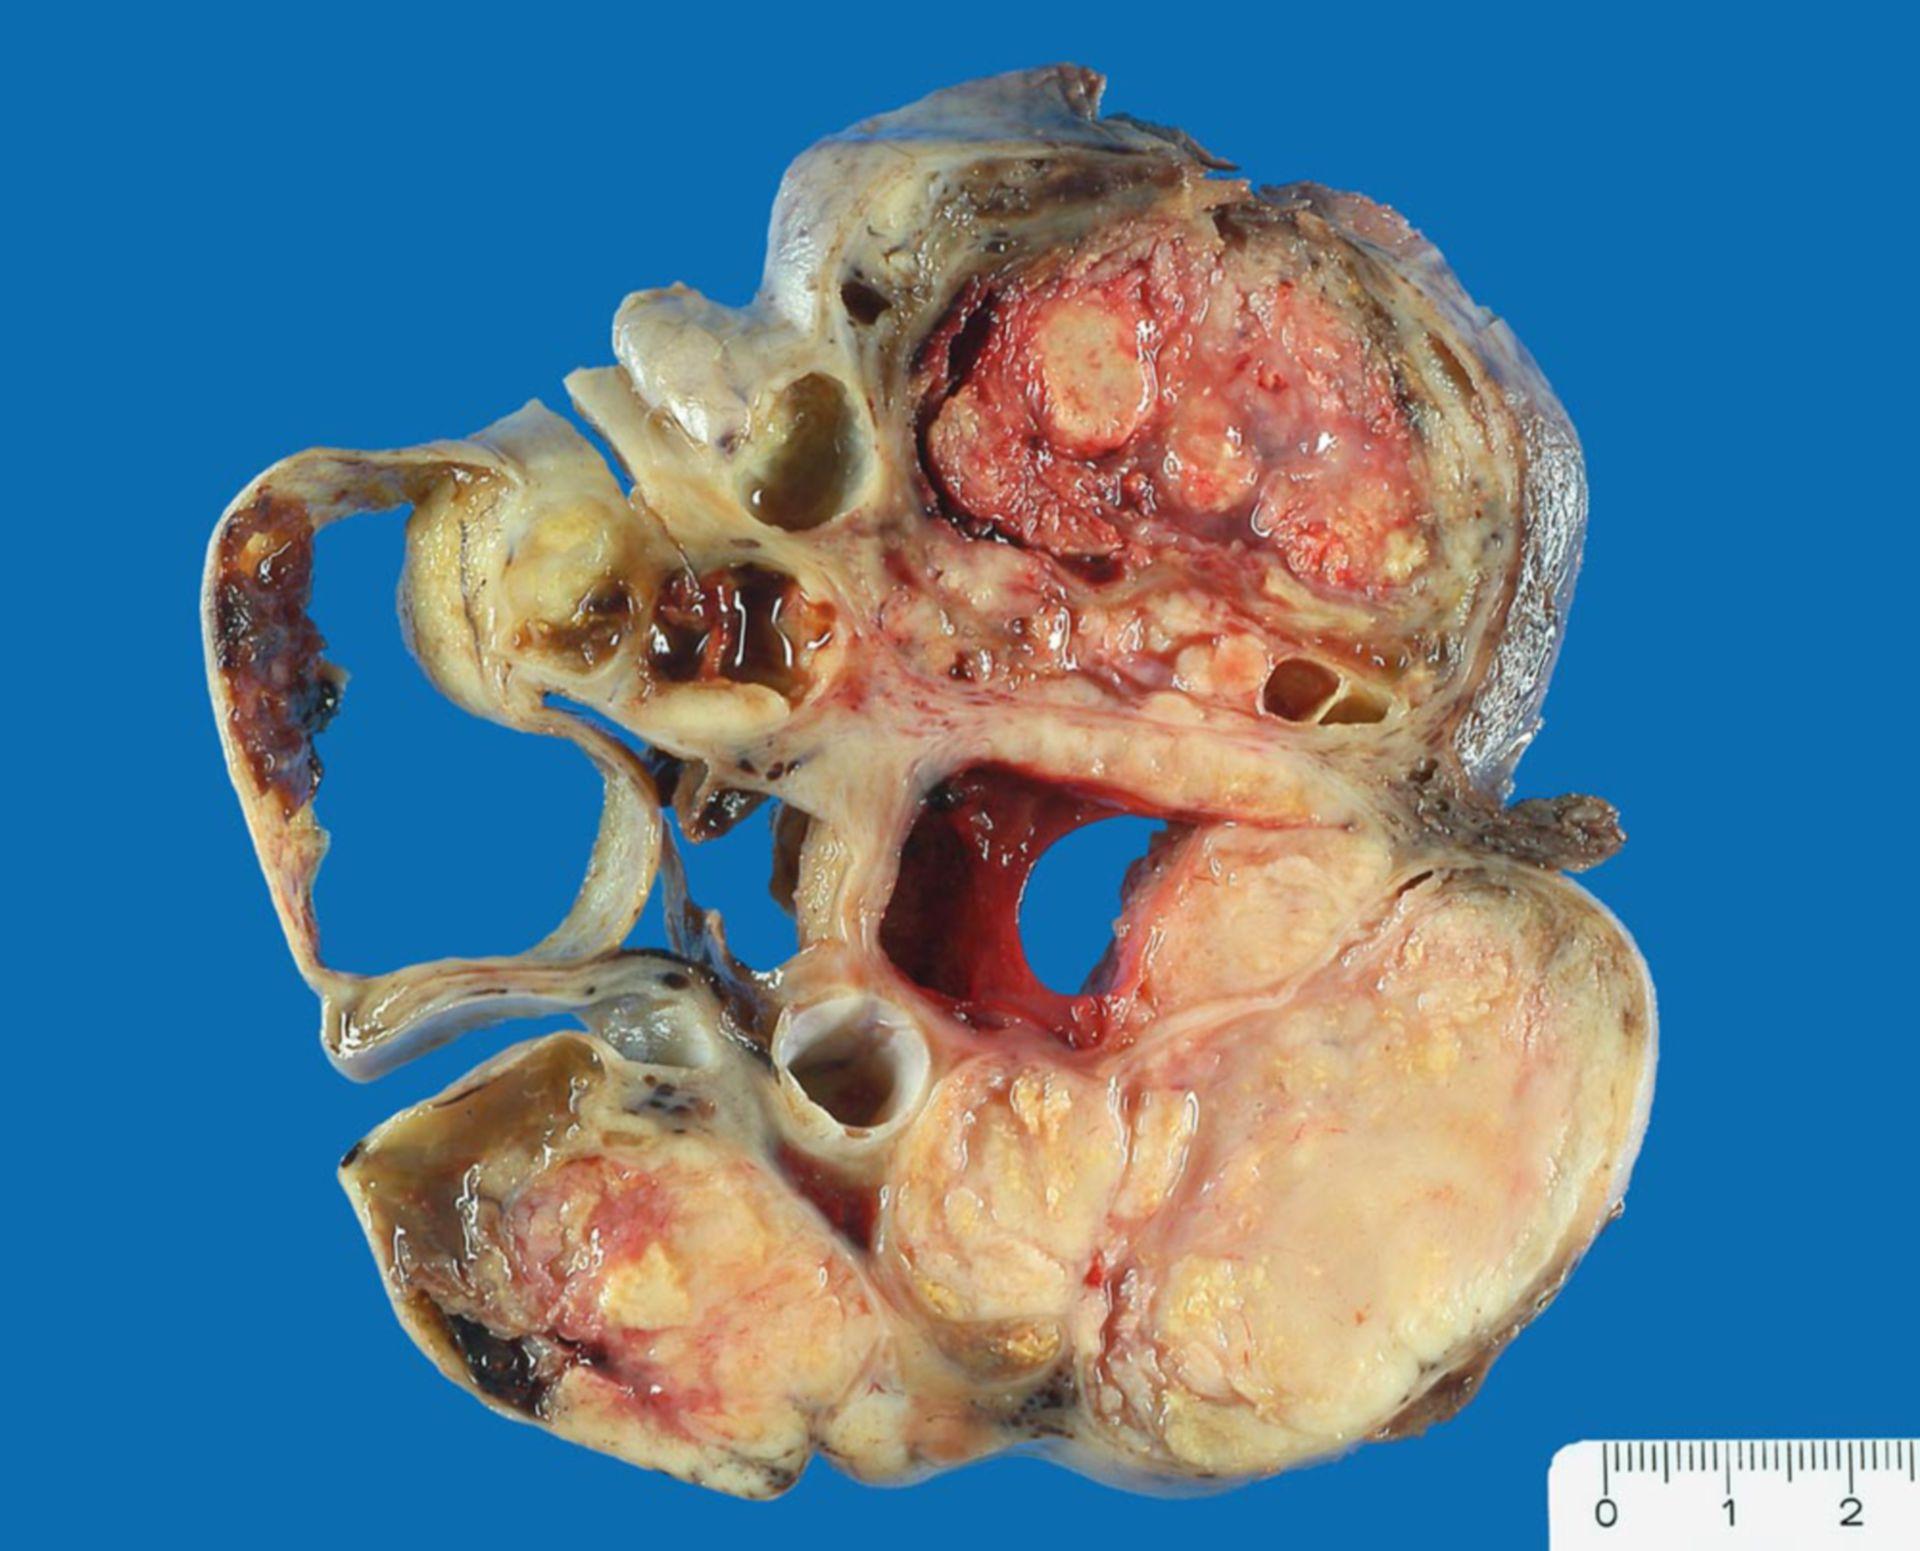 Serous papillary cystadenocarcinoma of the ovary